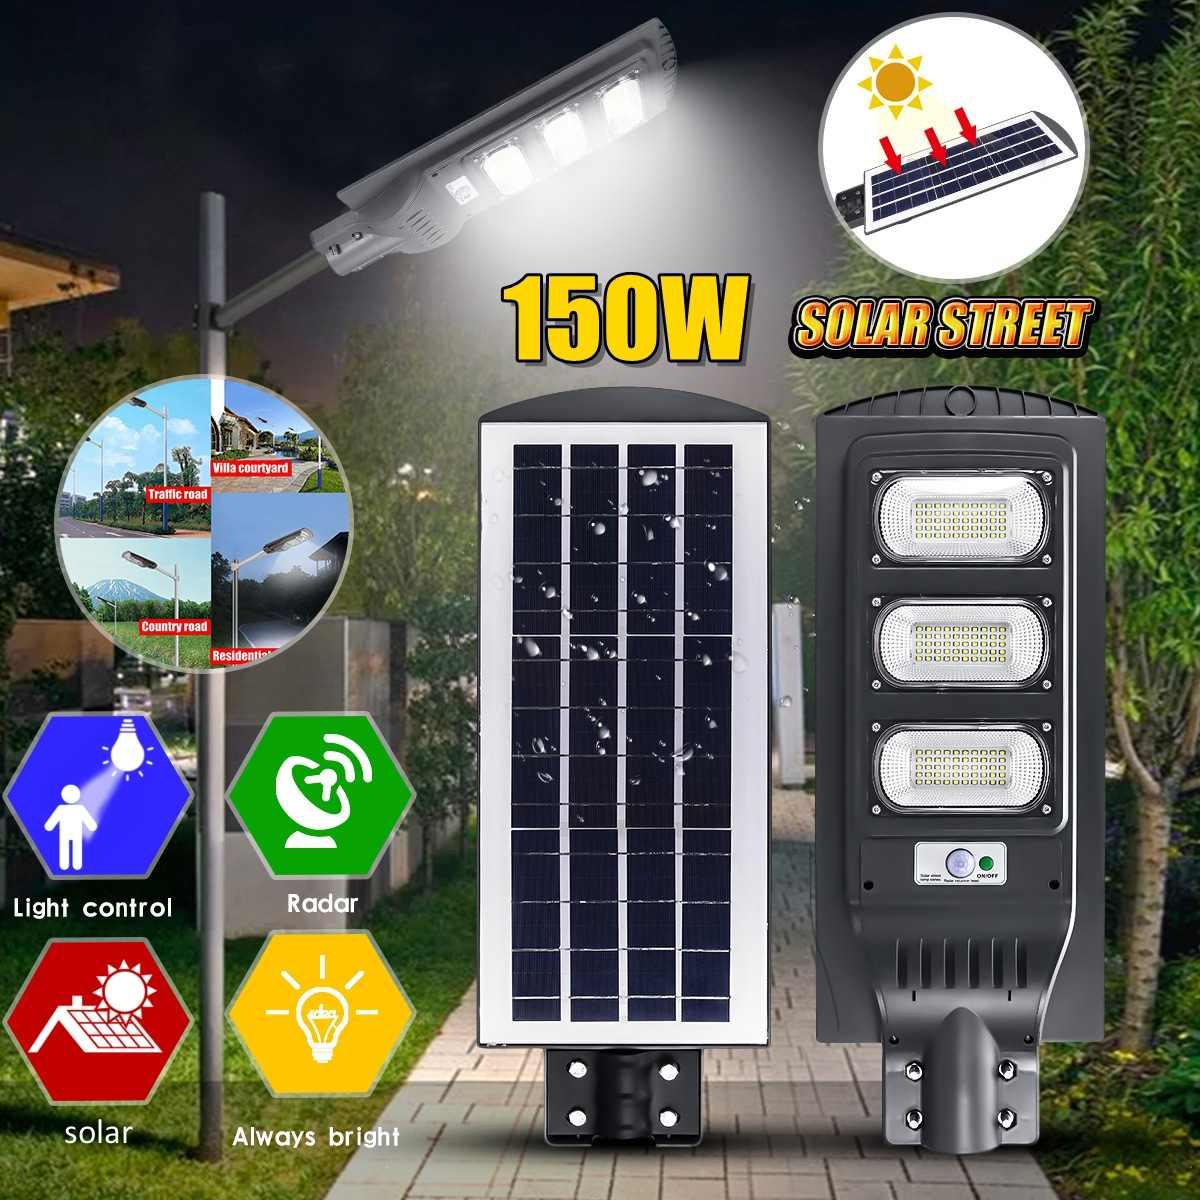 Smuxi 150W LED 3030 High-brightness Chip LED Solar Street Light Outdoor Lighting Security Lamp Motion Sensor Street Lamp